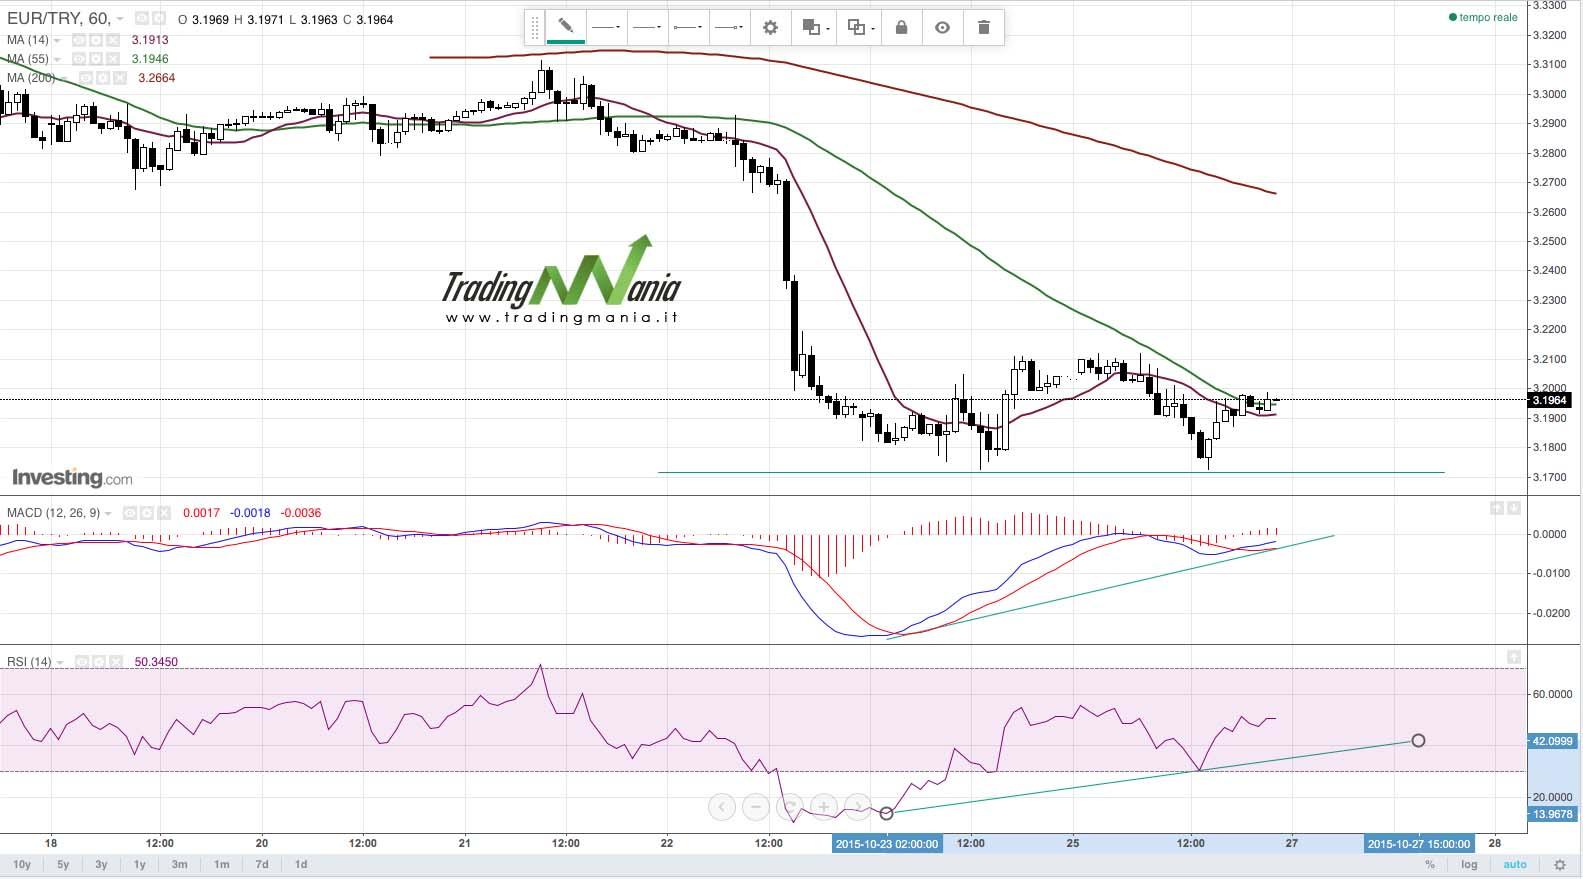 Strategia di trading online su Forex EURTRY